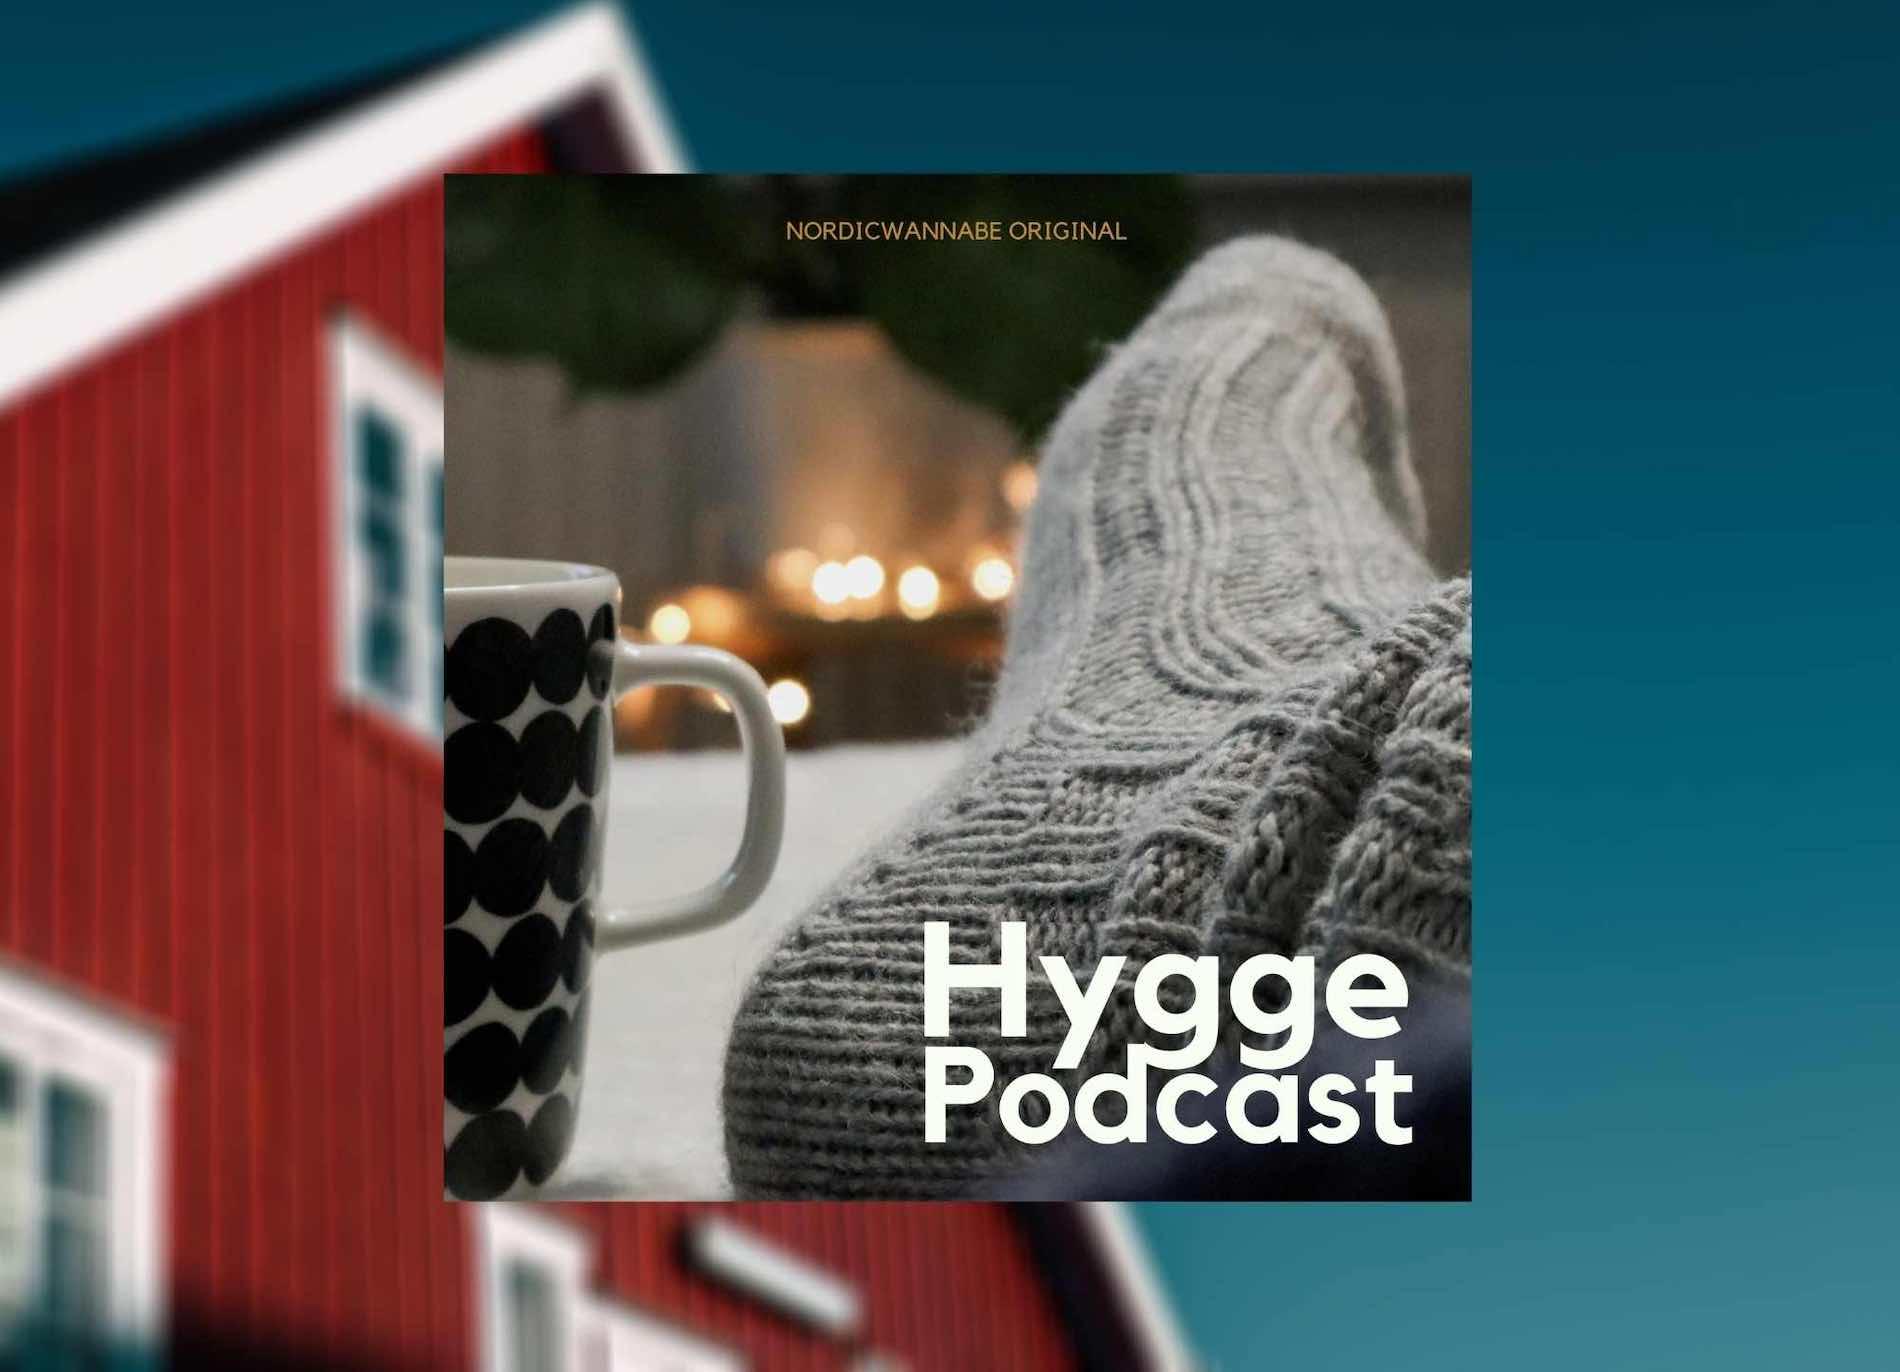 Hygge Aussprache. Hyggelig, Dänisch, Glück, Hygge , Hygge Podcast